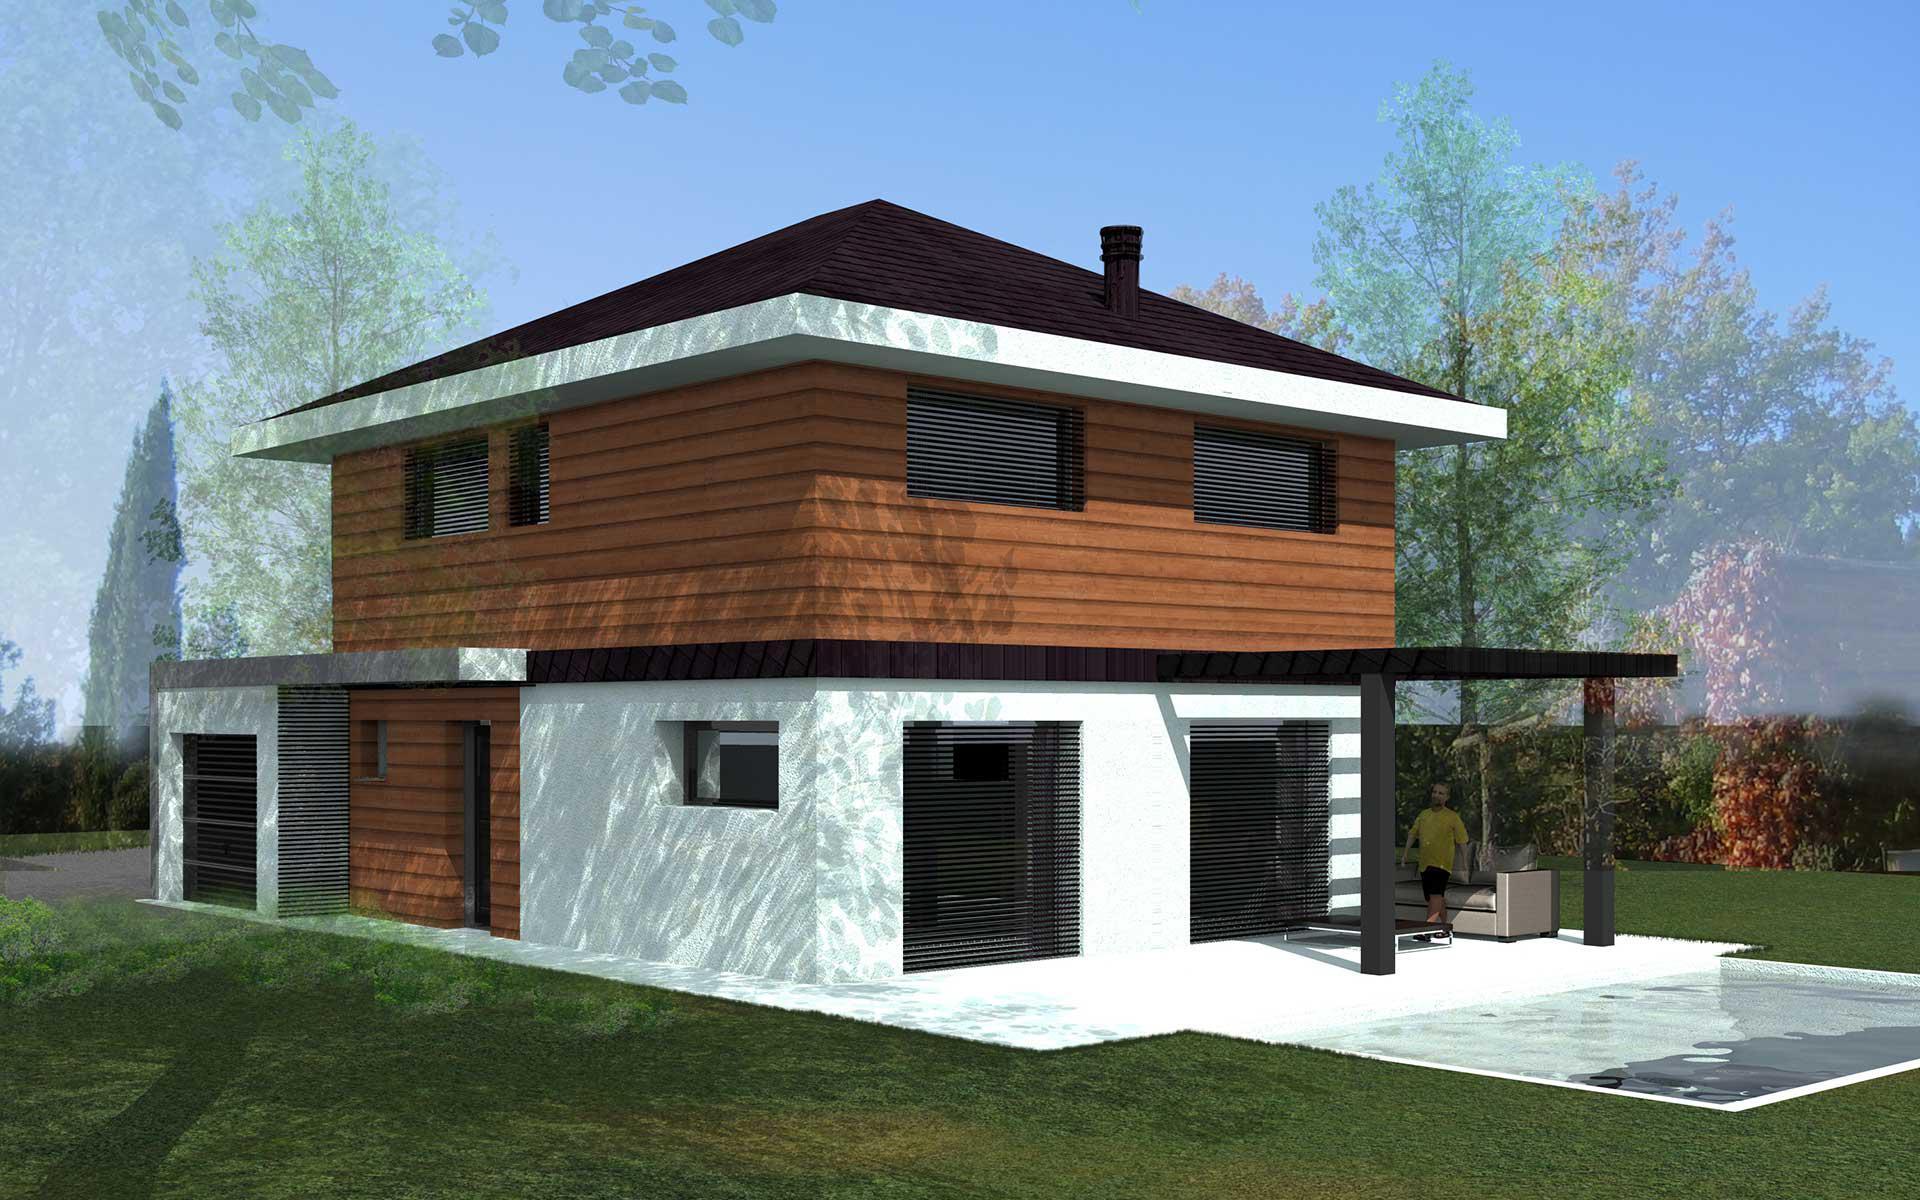 B1 maisons oxyg ne for Avis maison oxygene